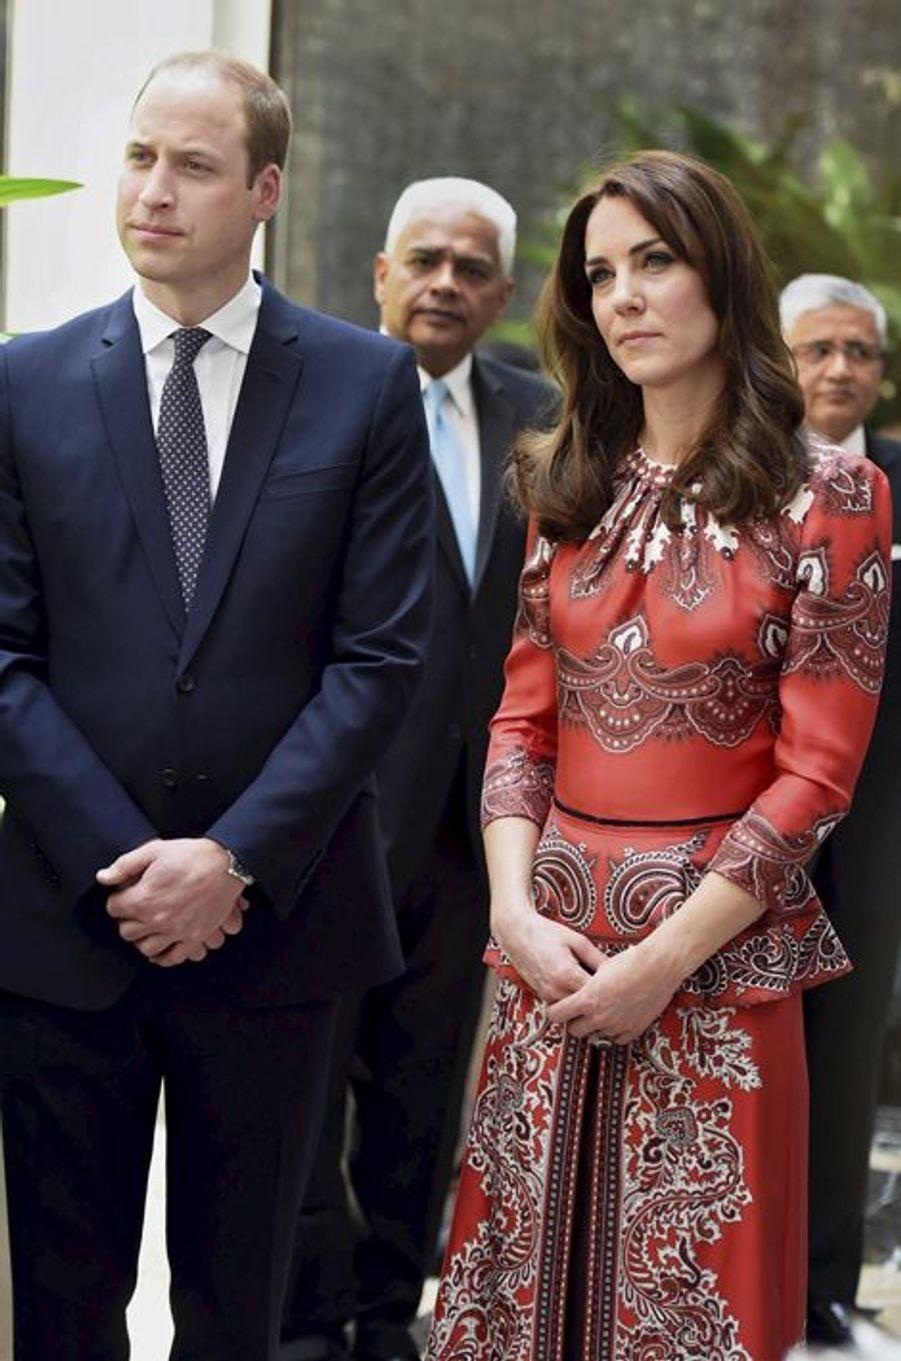 La duchesse Catherine de Cambridge en Alexander McQueen, le 10 avril 2016